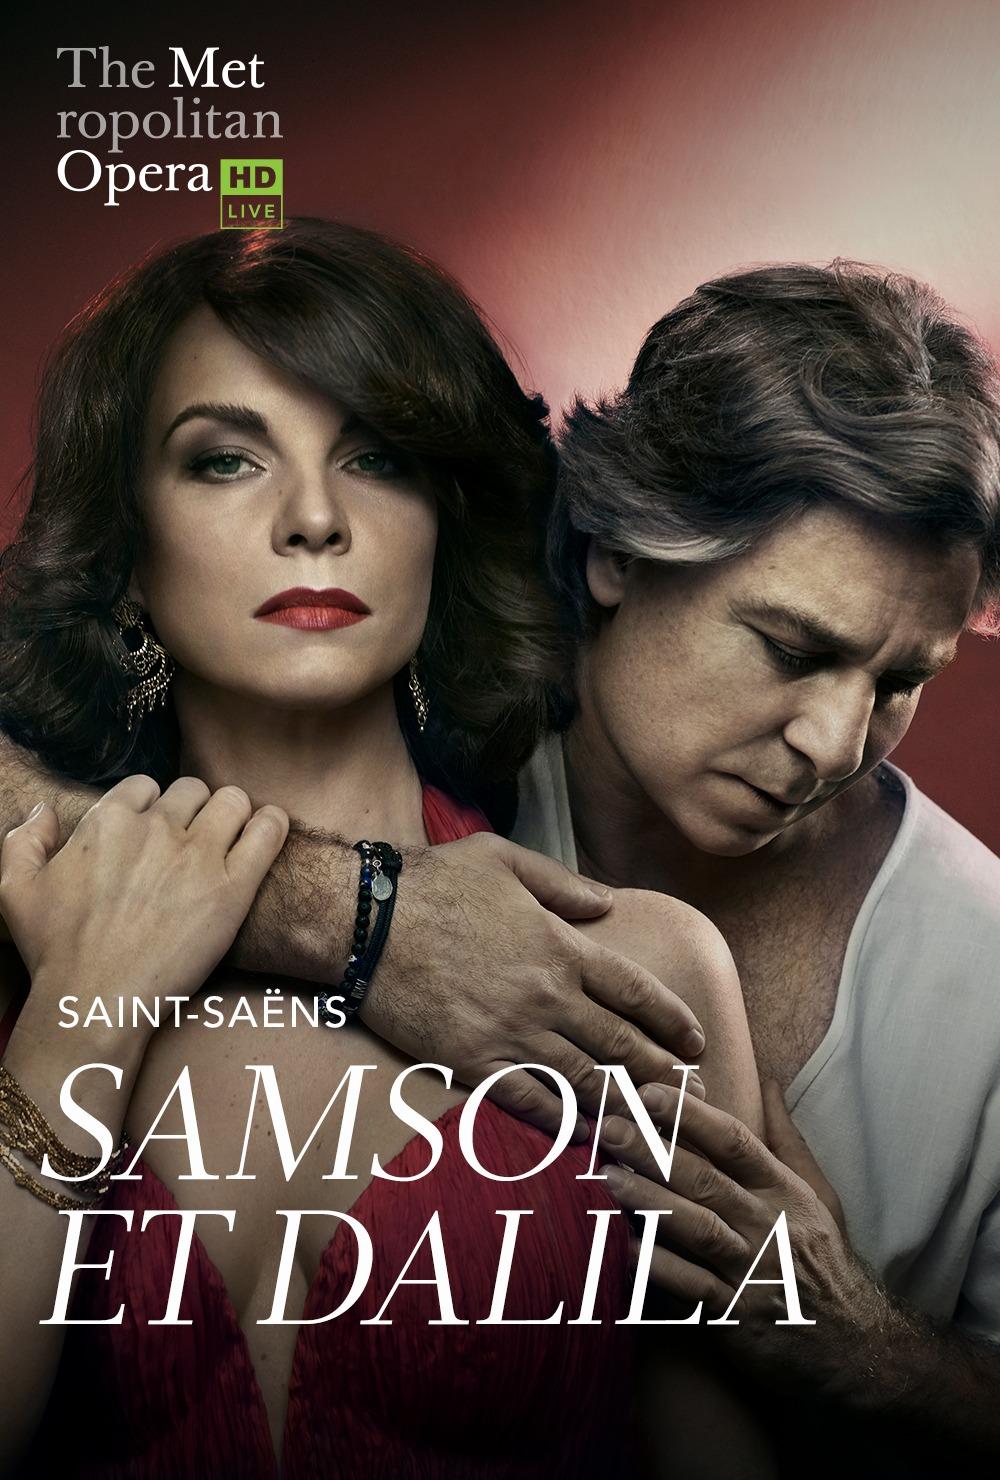 Met-Samson Et Dalila-Encore